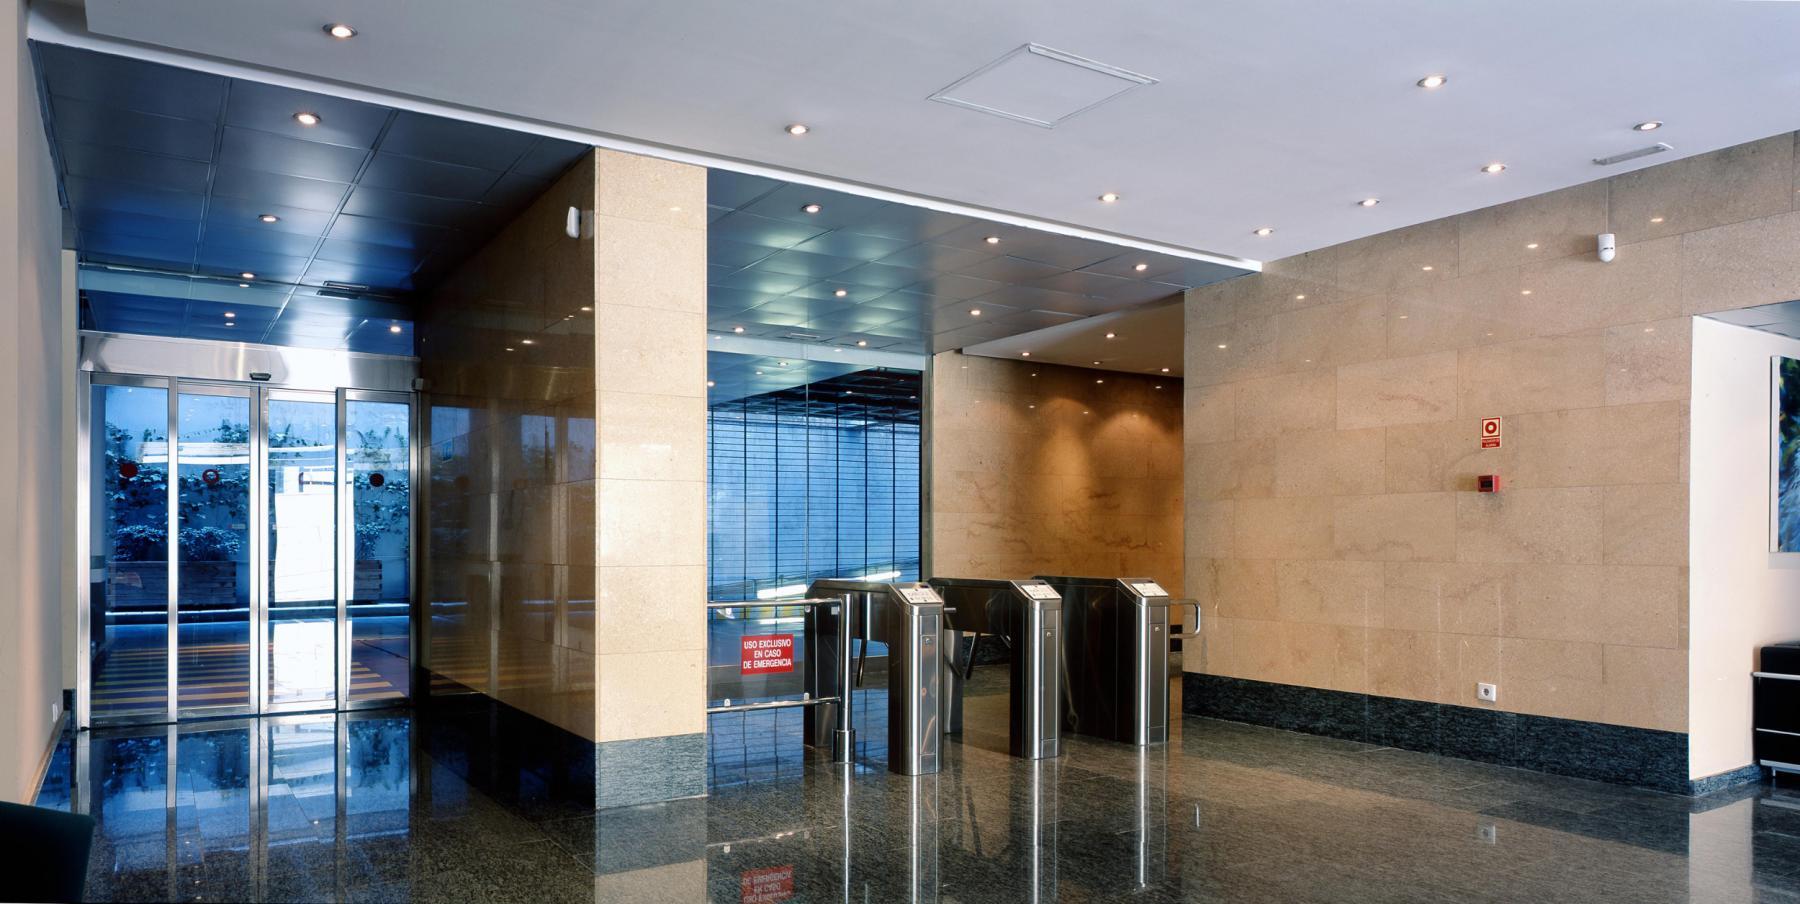 Alquilar oficinas Calle de Serrano Galvache 33, Madrid (3)